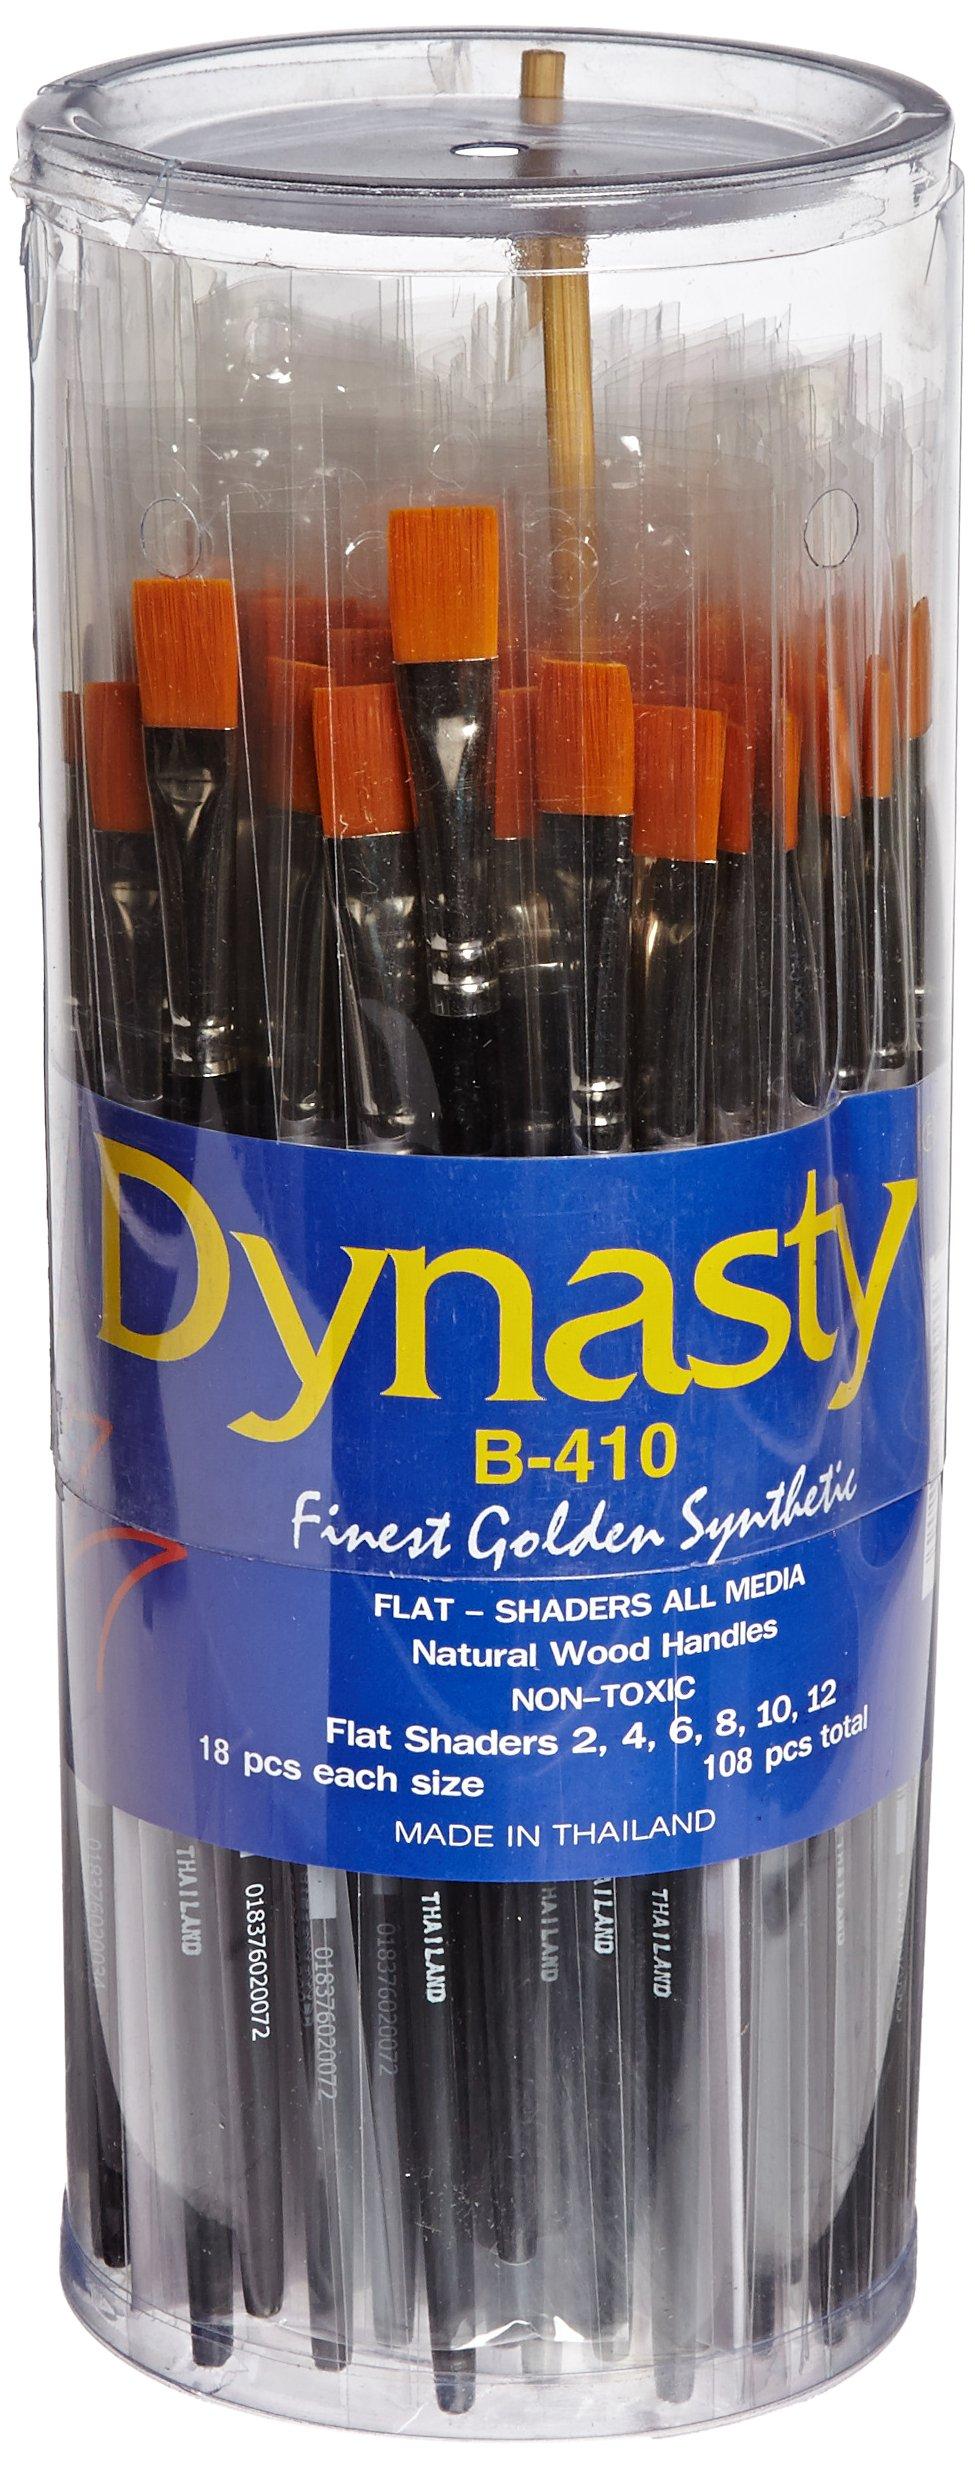 Dynasty B-410 Golden Synthetic Flat Shader Brush - Assorted Sizes - Set of 108 - Black